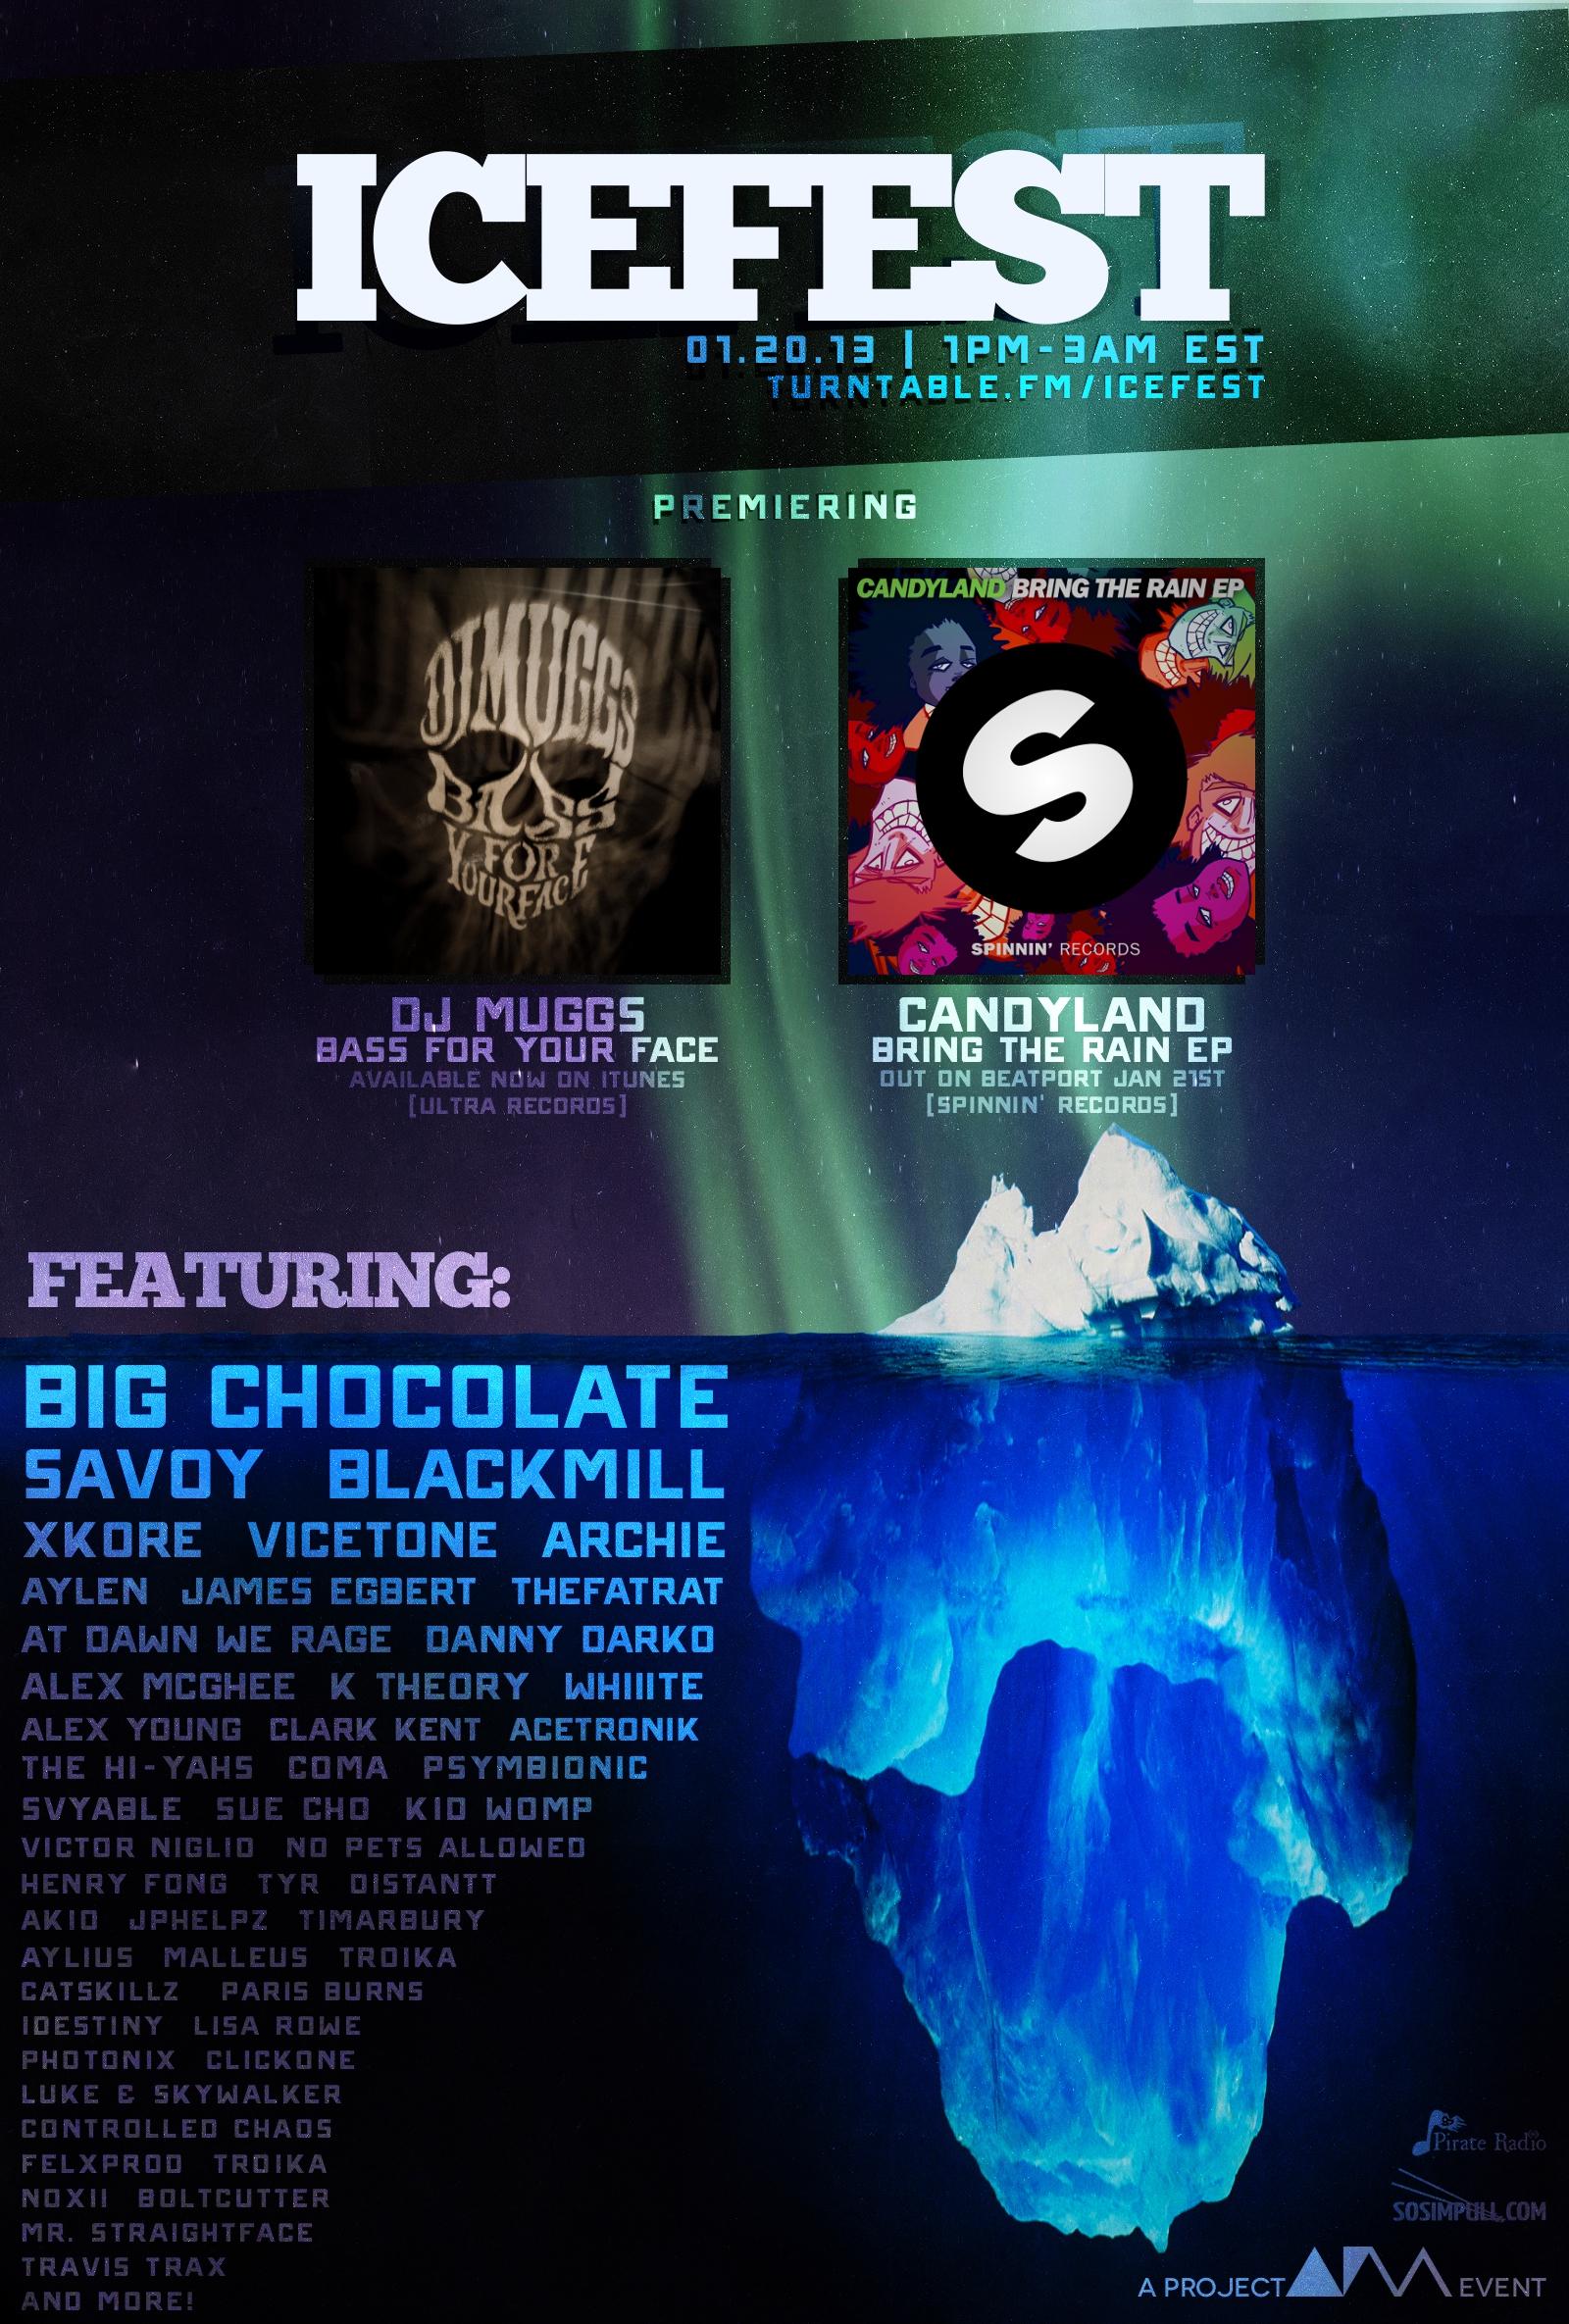 IceFest 2013 Artist LineUp